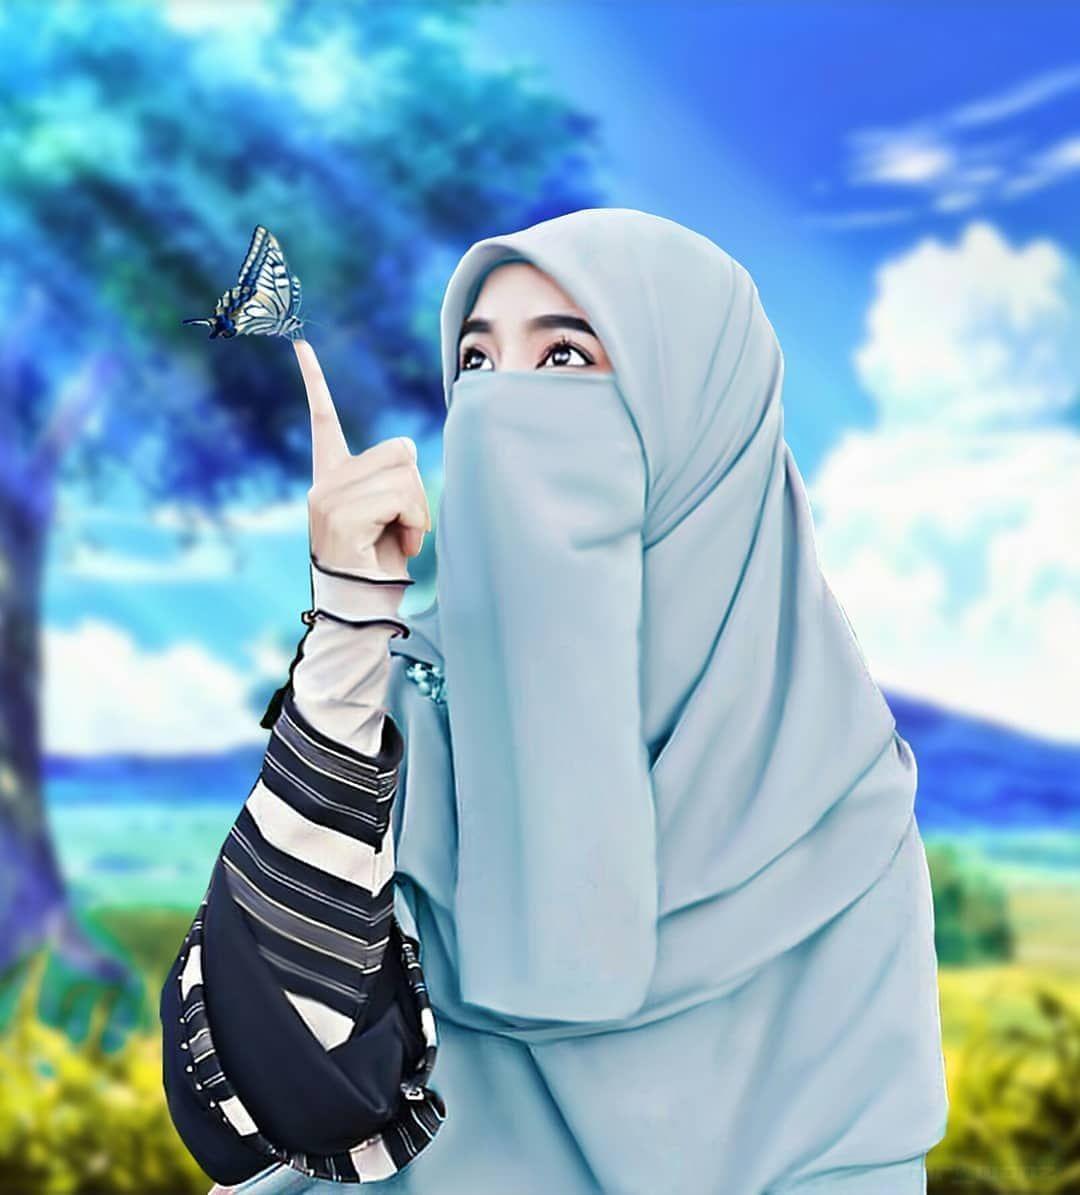 Gambar Muslimah Bercadar   Islamic girl pic, Arab girls hijab ...